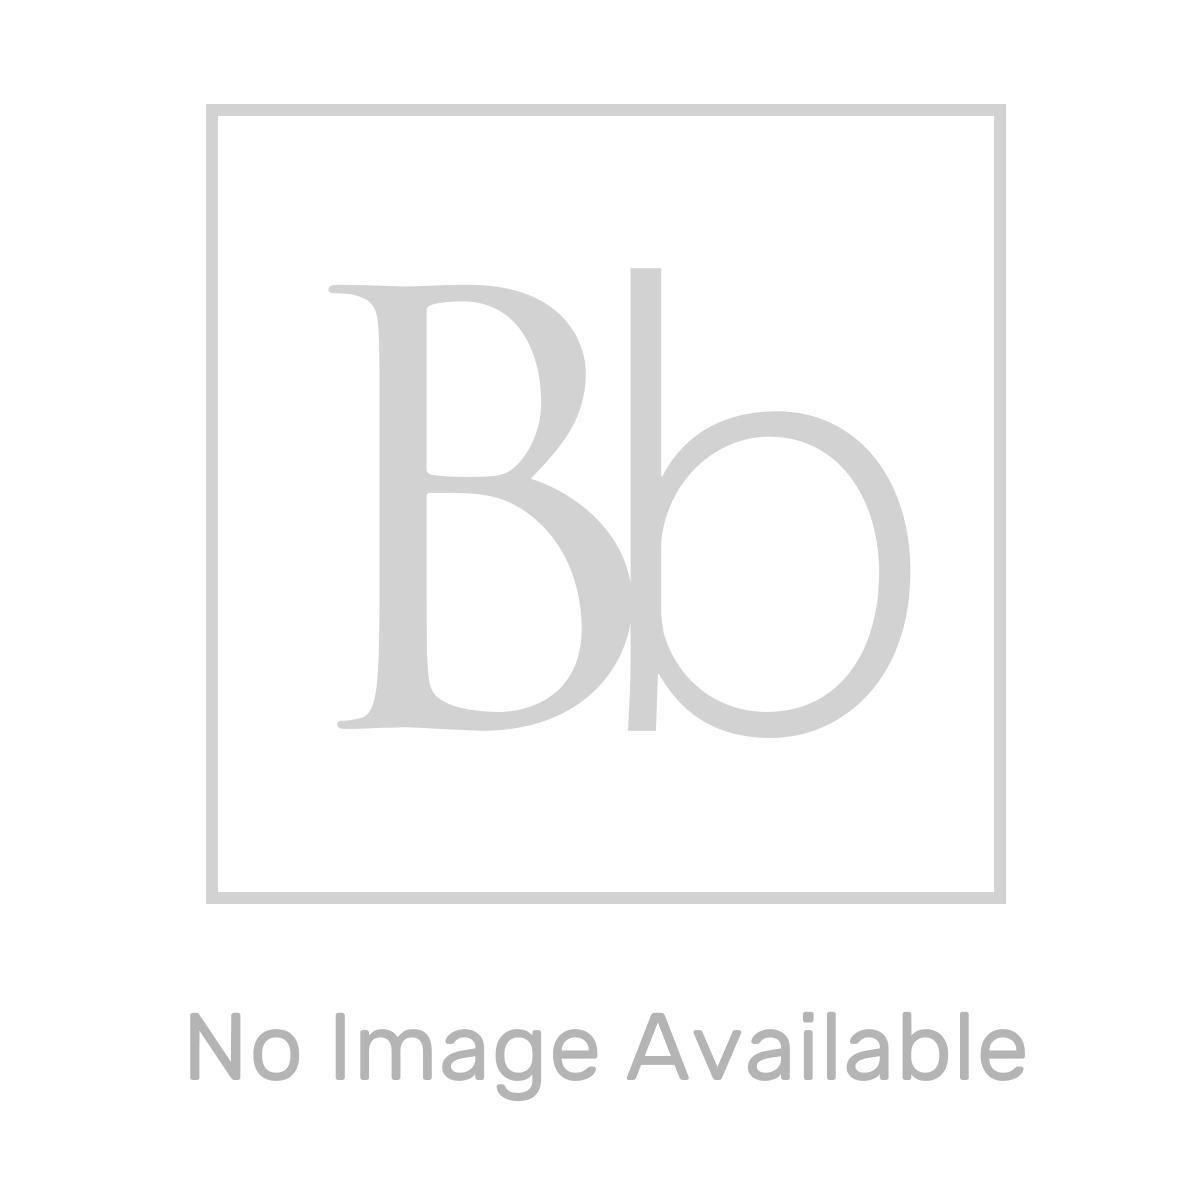 RAK Black Square Ceiling Mounted Shower Arm 120mm Measurements